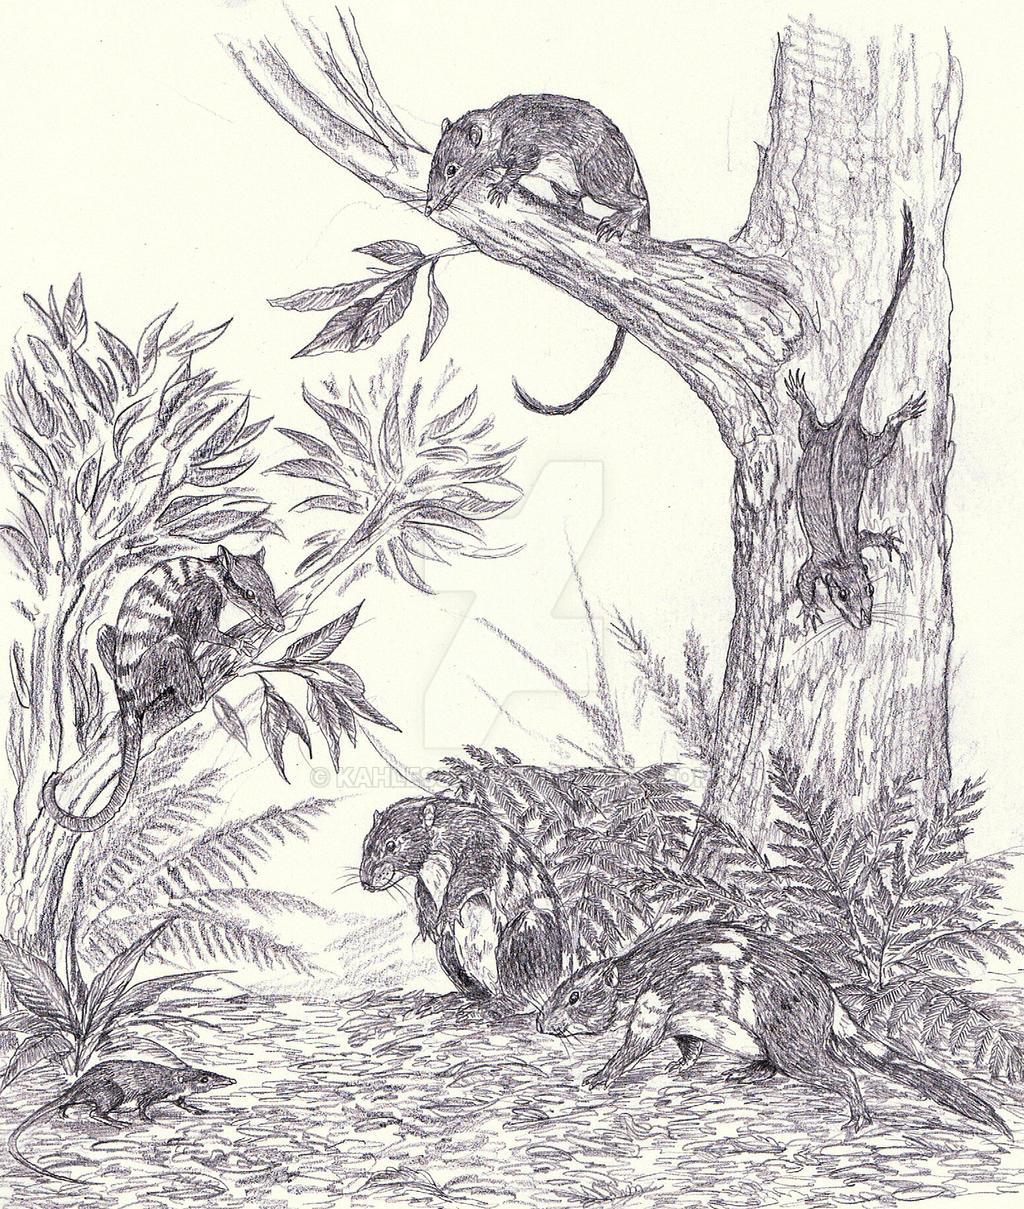 Cretaceous mammals by Kahless28